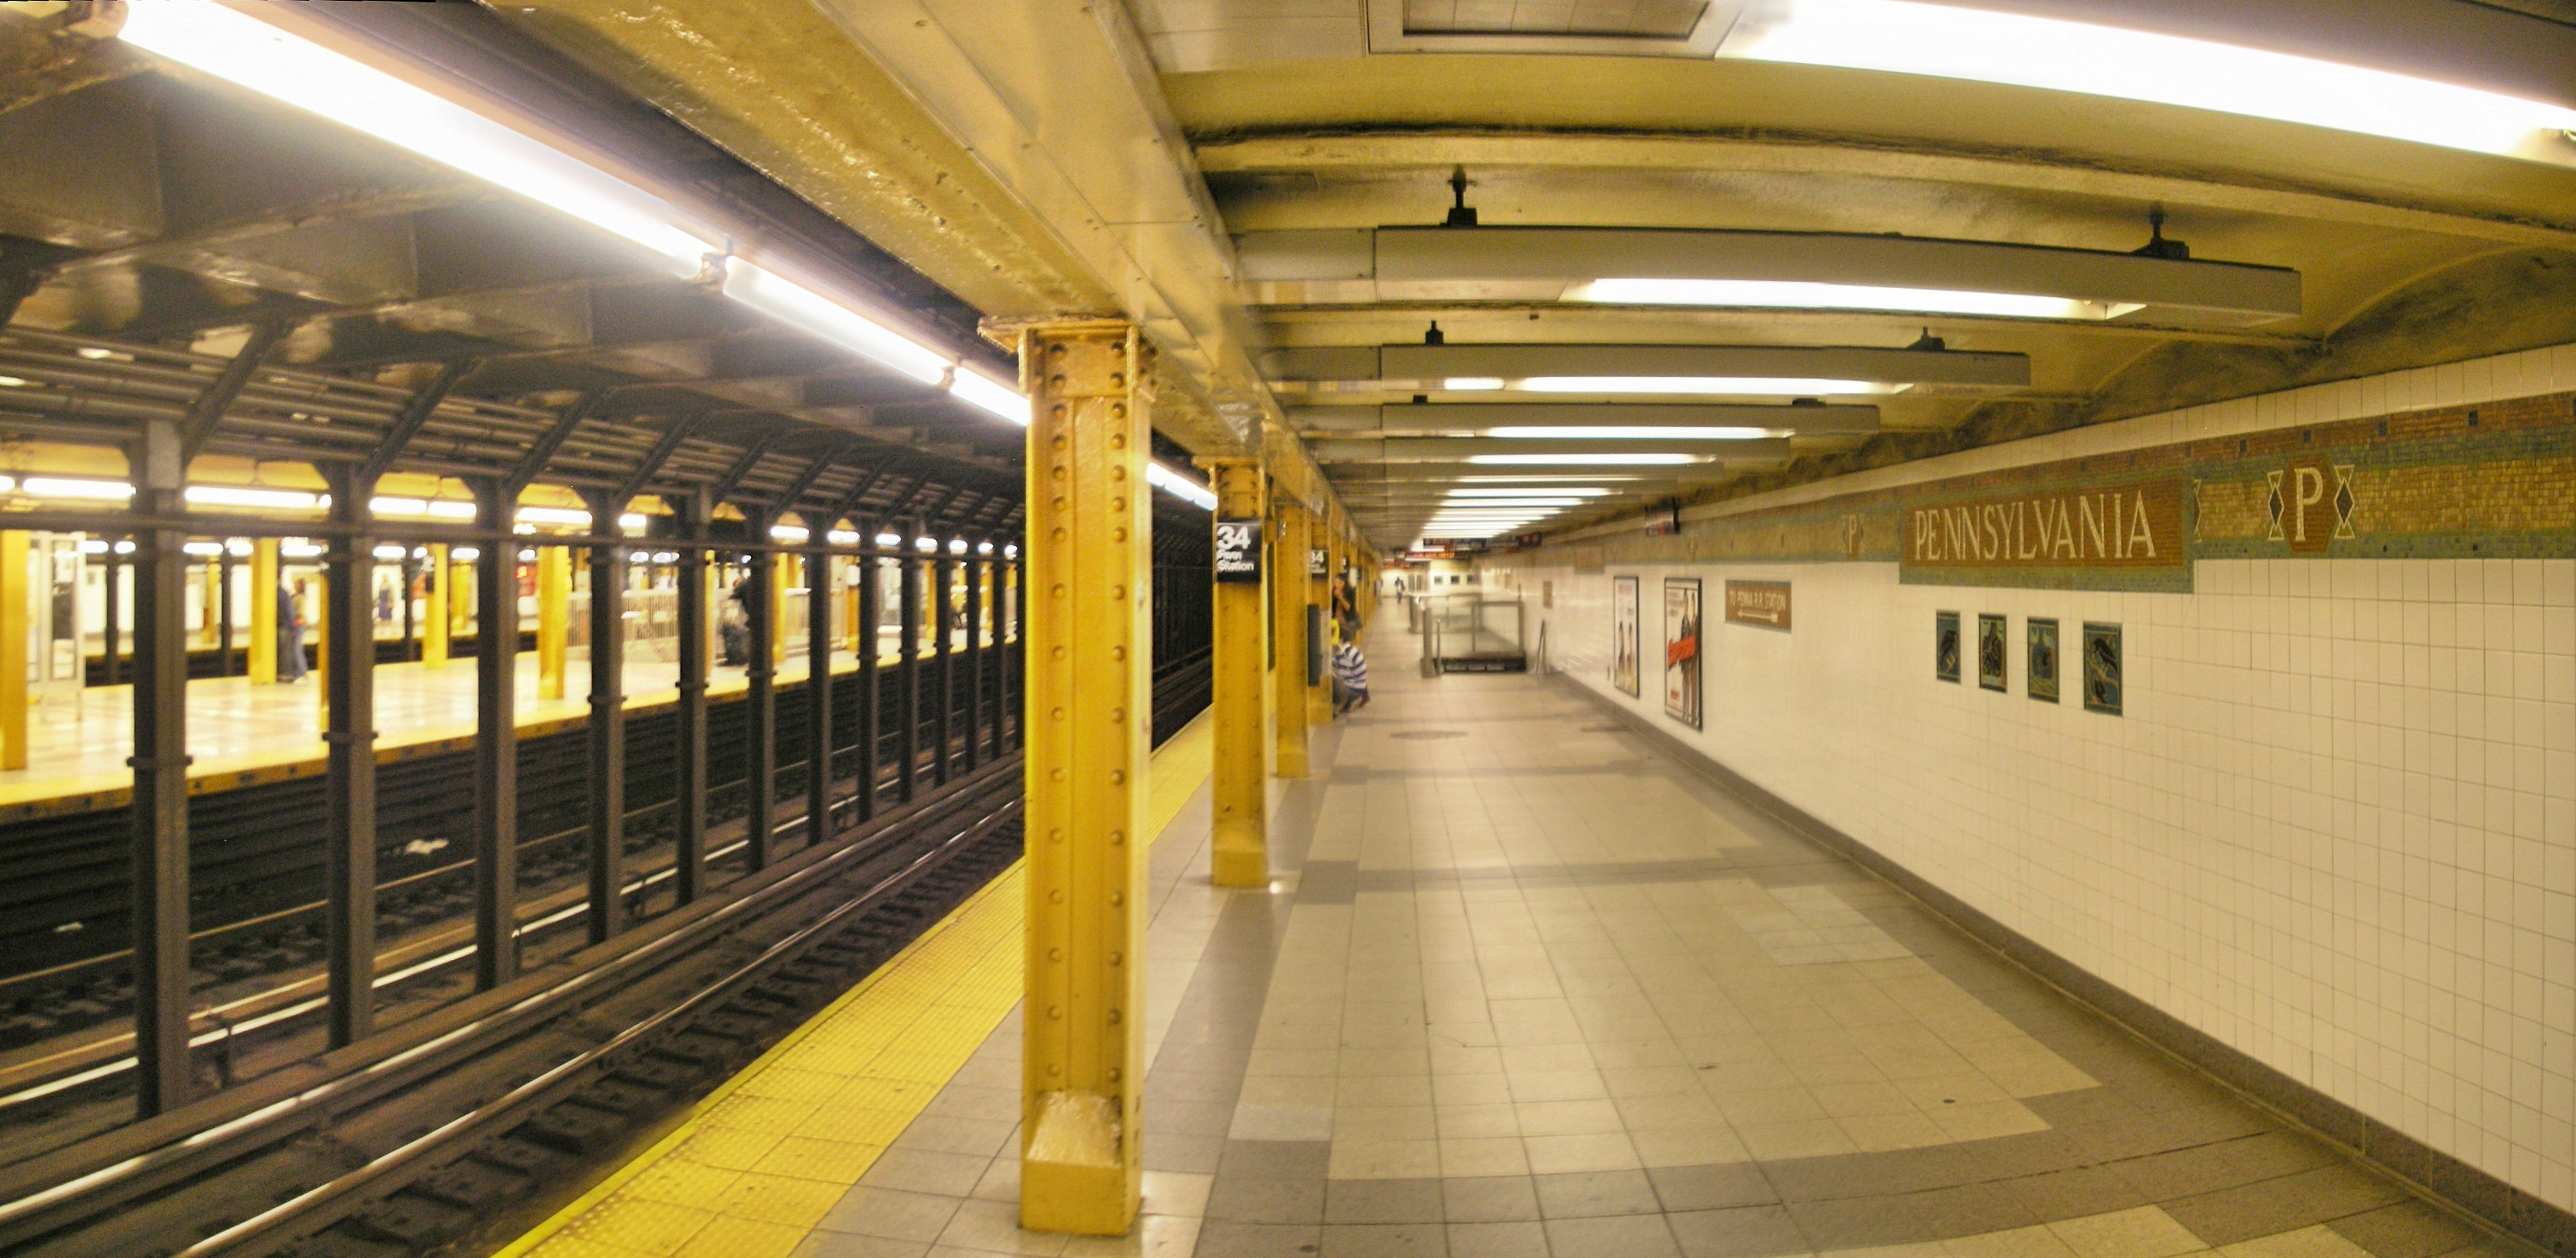 Penn Station Nyc Subway Map.34th Street Penn Station Irt Broadway Seventh Avenue Line Wikipedia